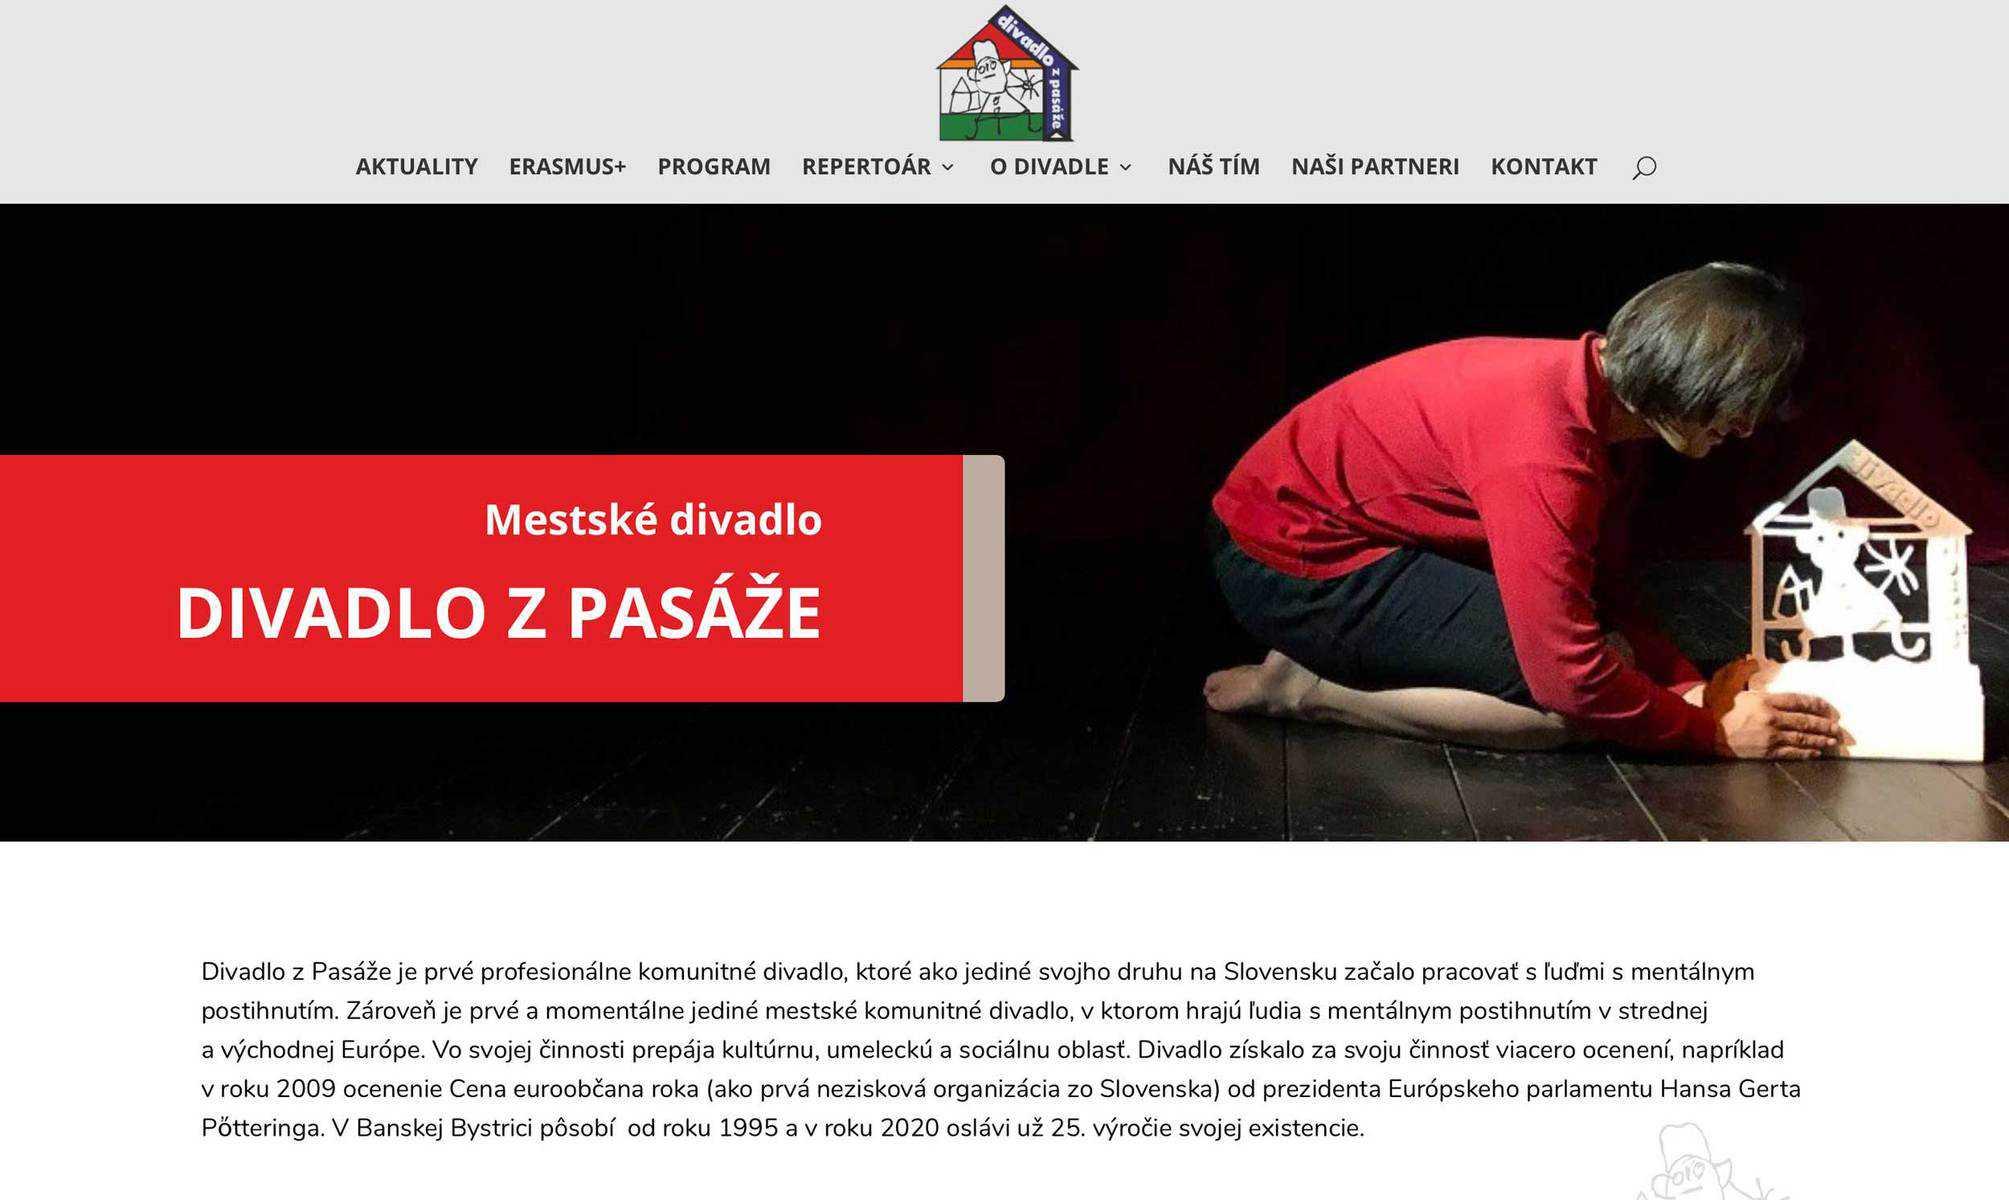 Webstránka Divadlo z Pasáže 6